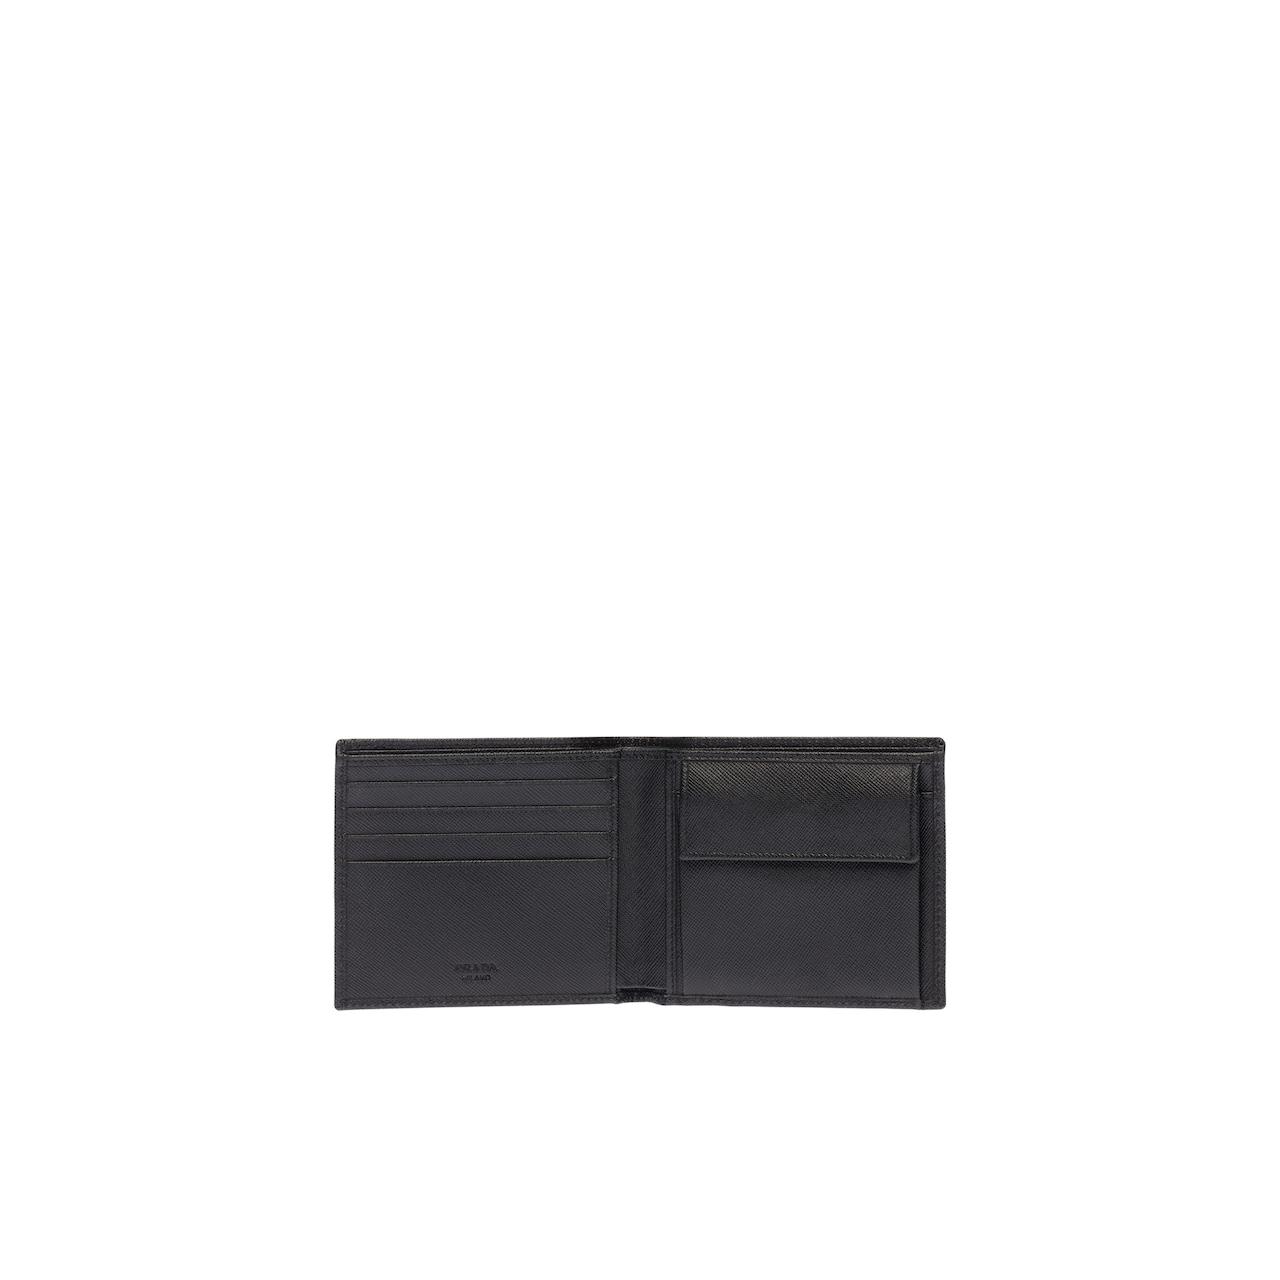 Prada Saffiano Leather Wallet 2